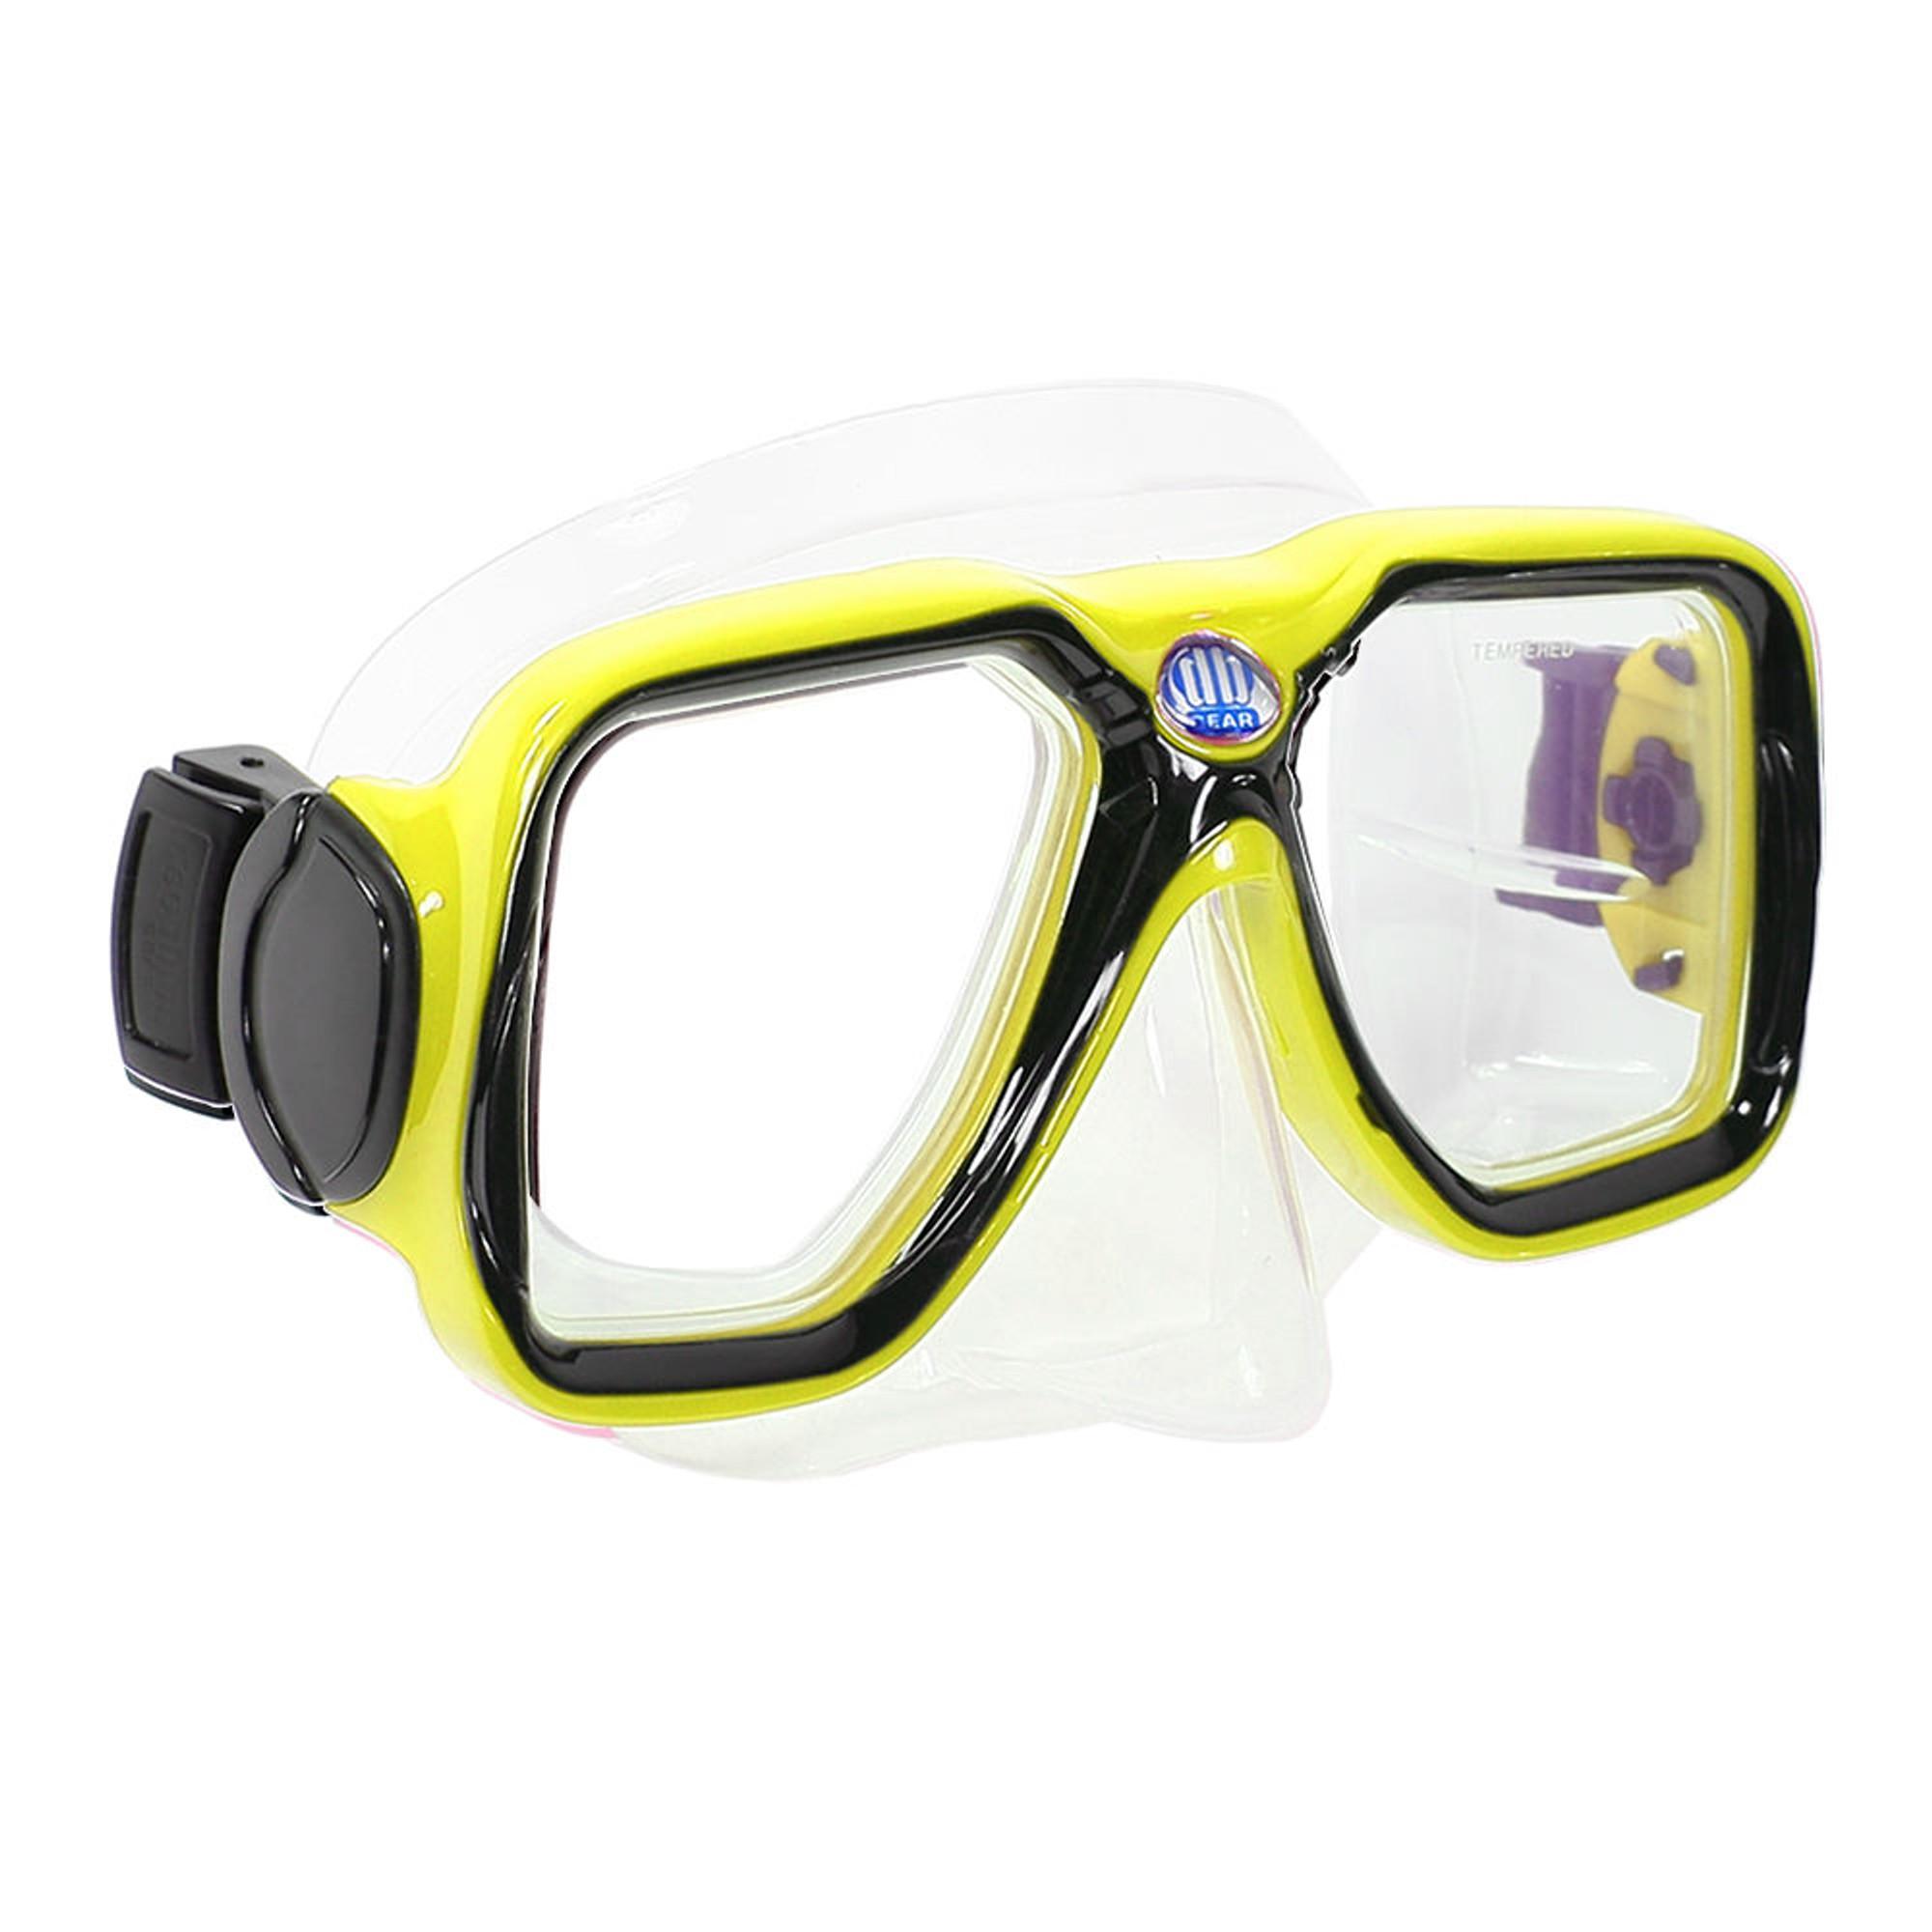 Maui - Prescription Diving/Snorkeling Mask